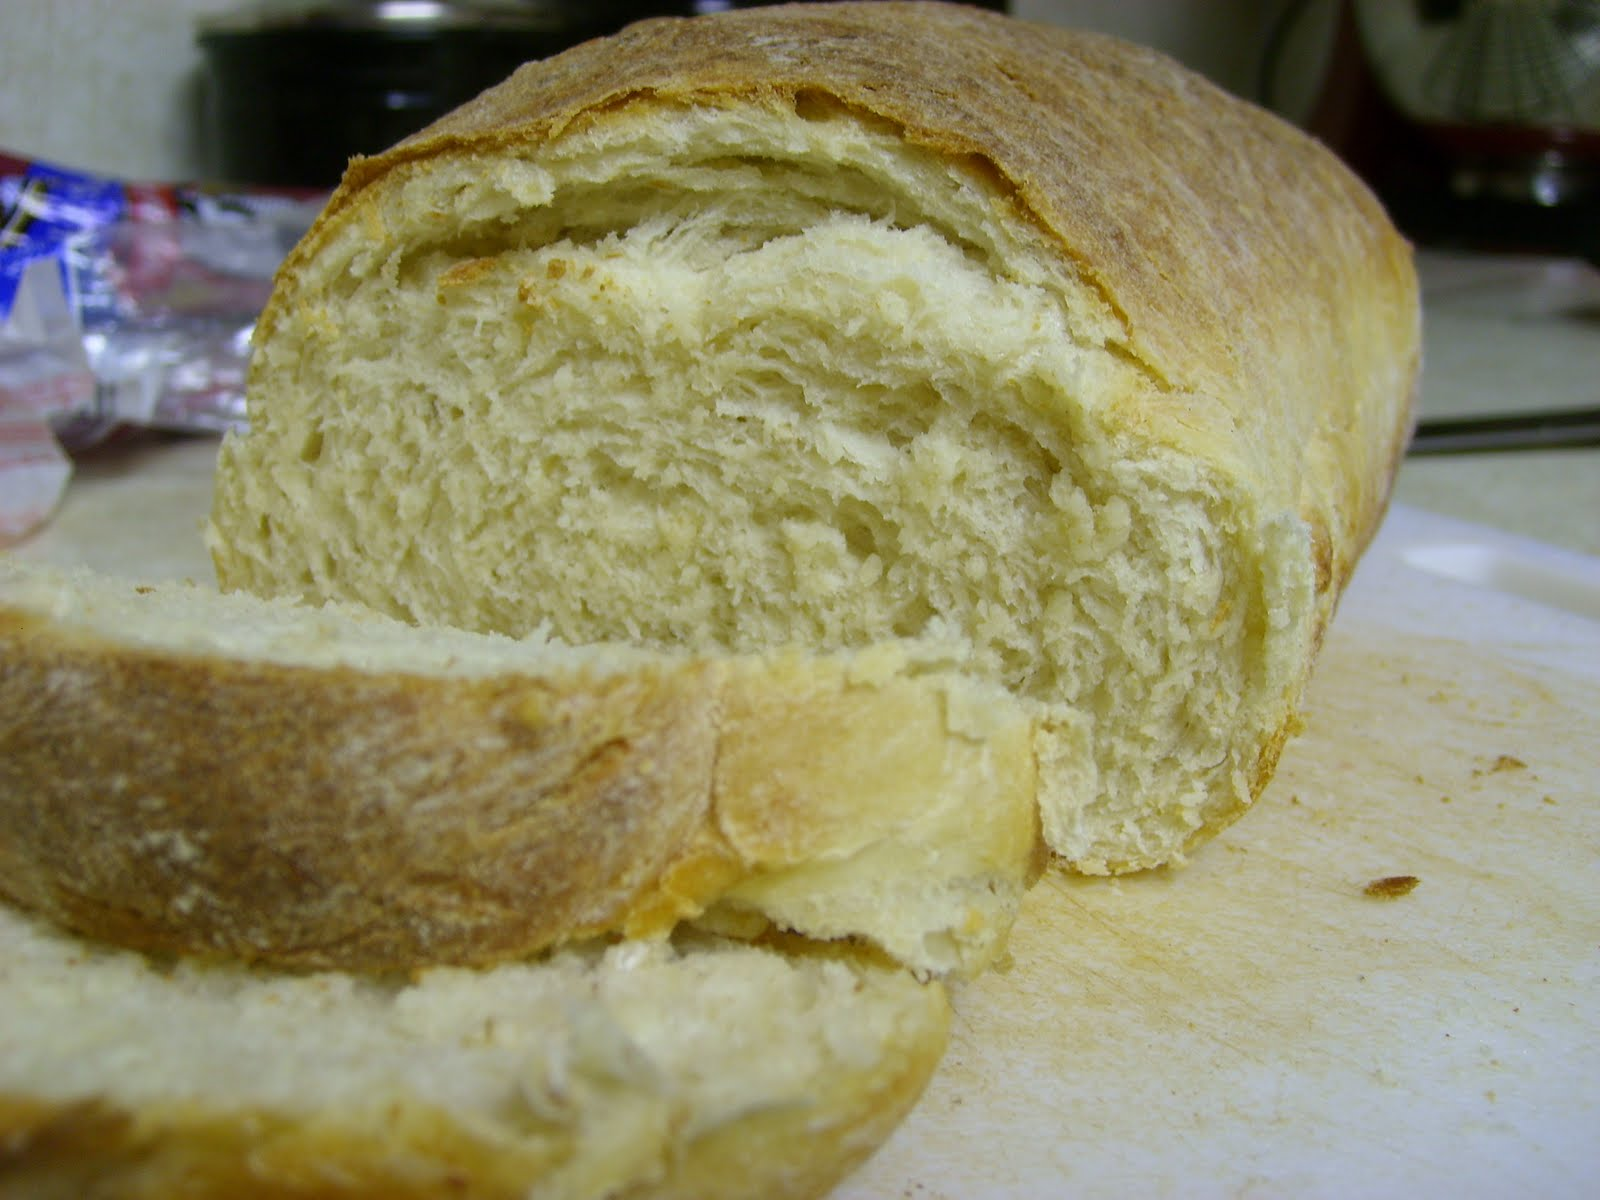 Adorkable Recipes: Buttermilk-Oatmeal Bread